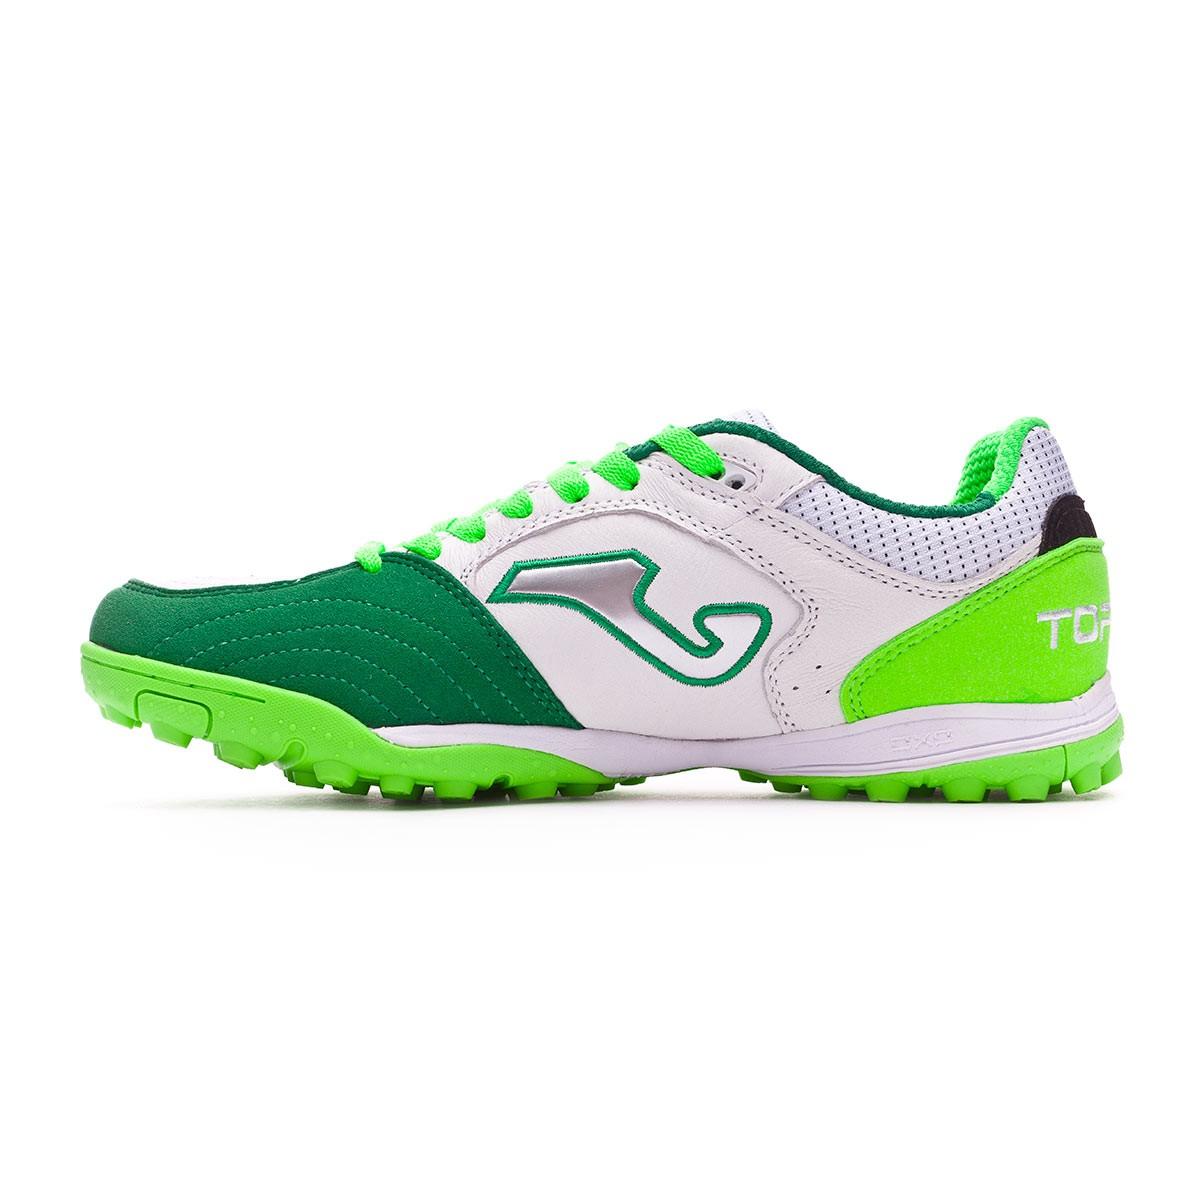 cae562d3c Football shoes Joma Scarpe da calcetto Calcio Top Flex Bianco verde Indoor  815 Scarpe da calcio